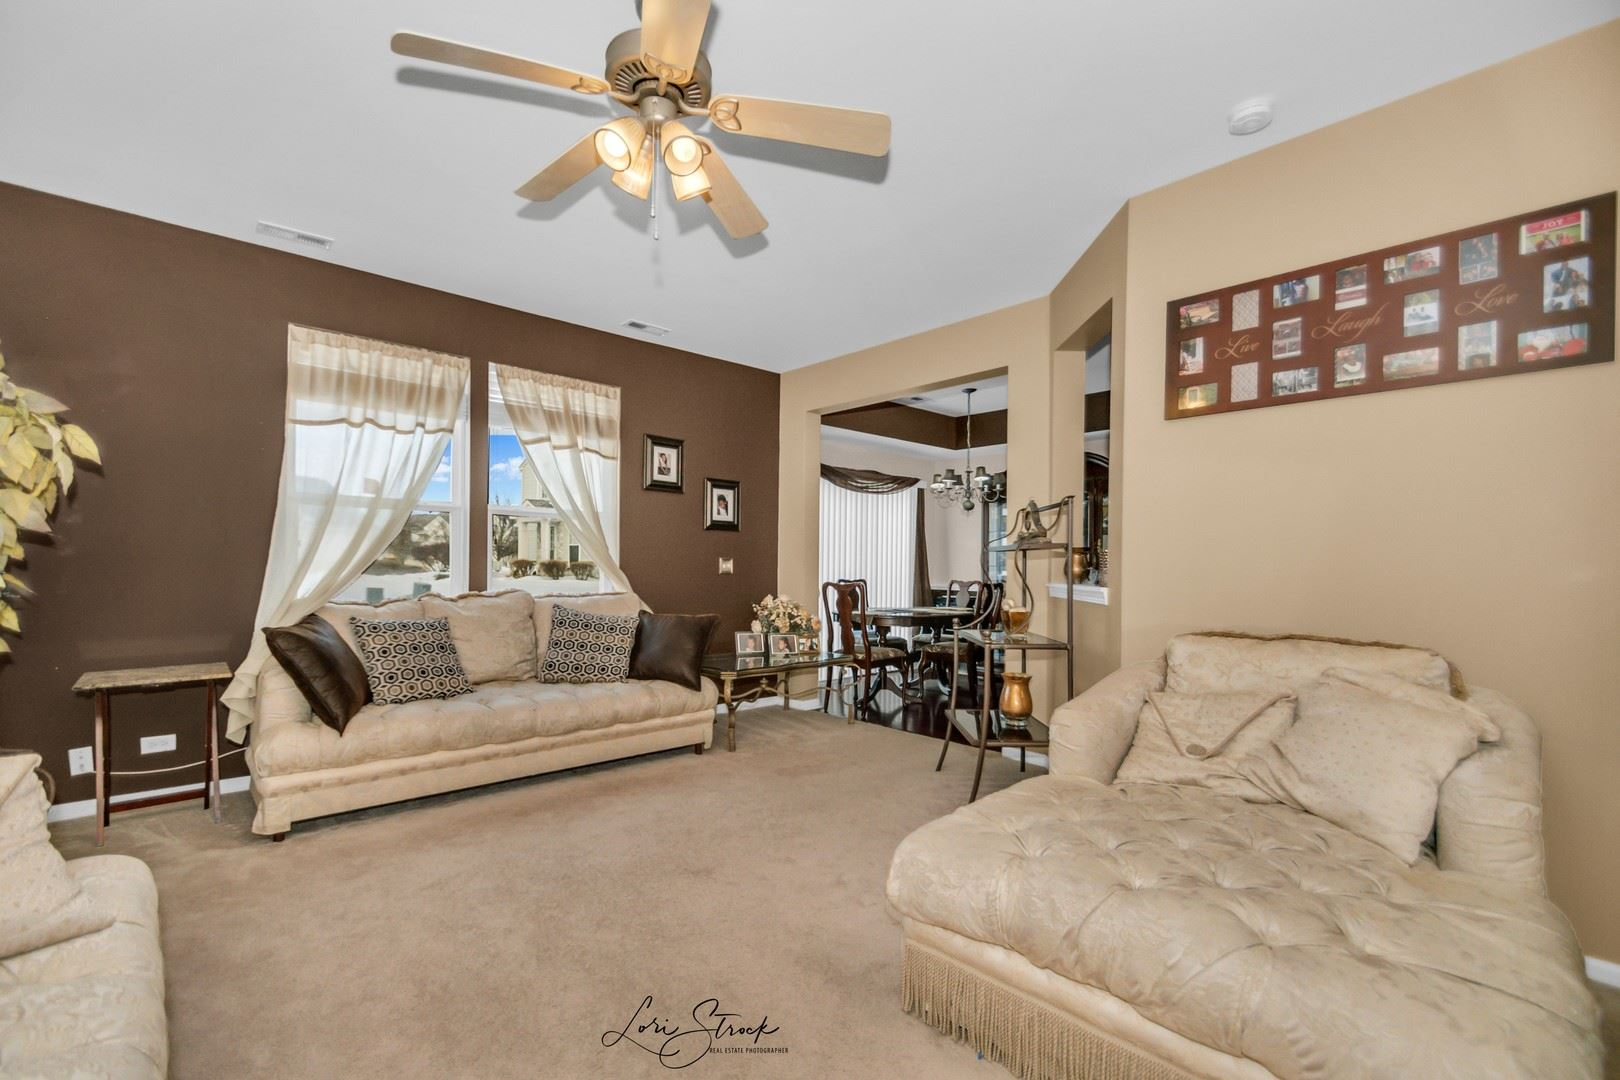 Photo of 24940 Franklin Lane #24940, Plainfield, IL 60585 (MLS # 11005127)